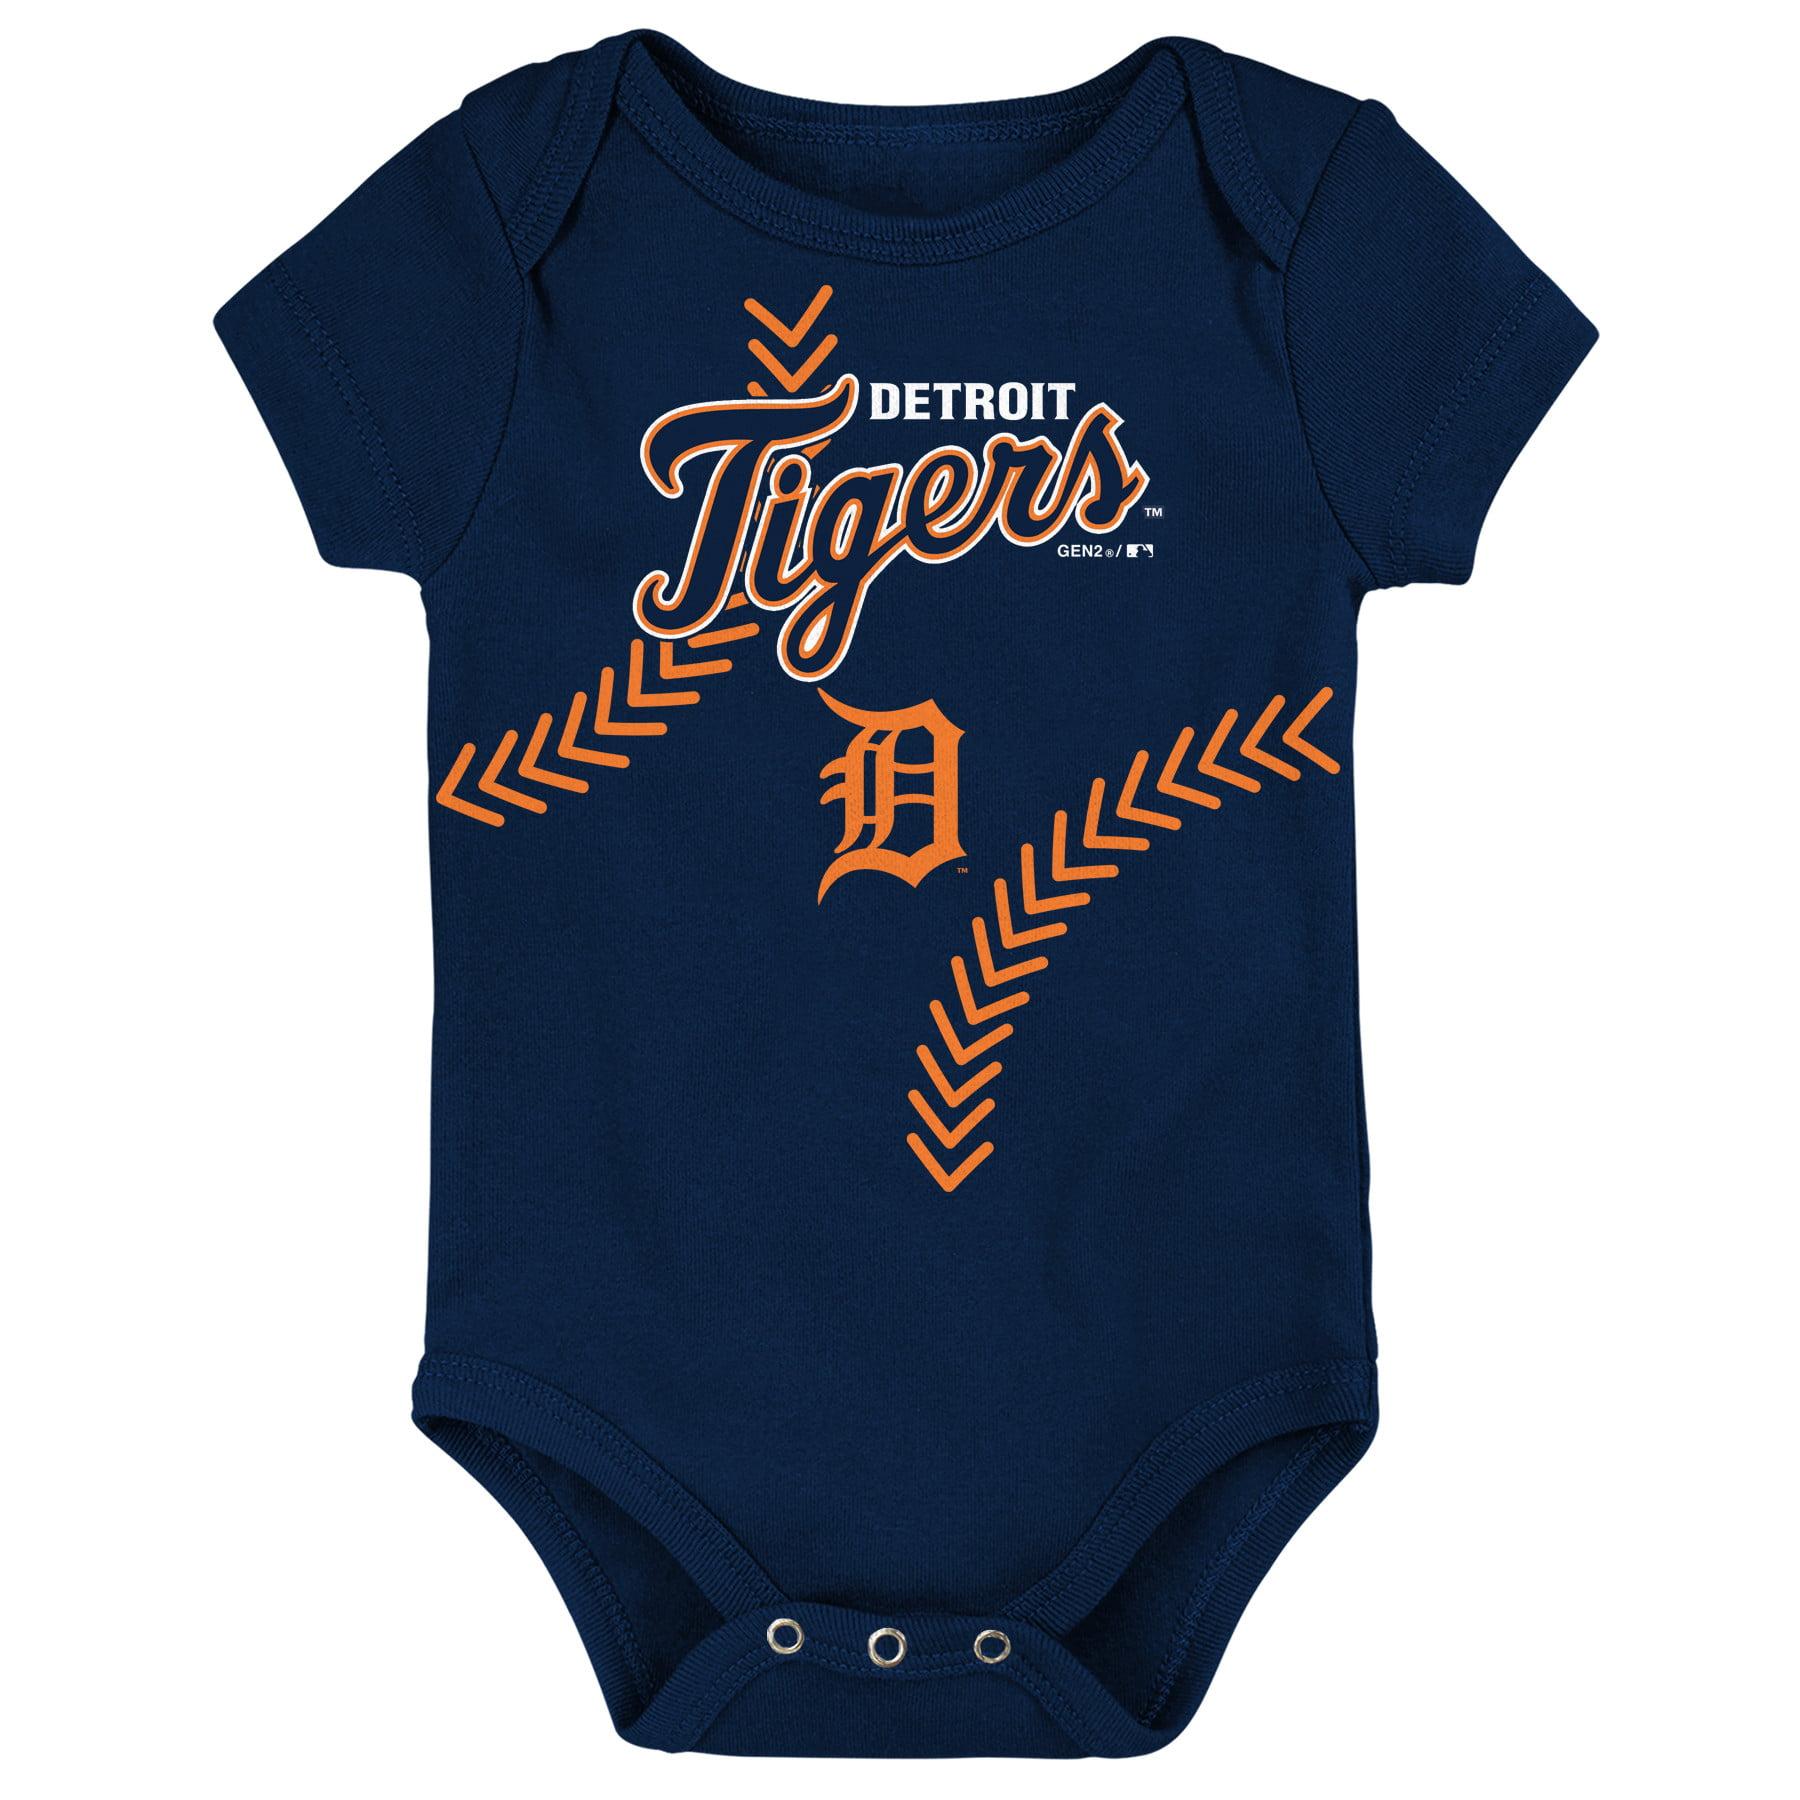 Detroit Tigers Newborn & Infant Fan-tastic Baseball Bodysuit - Navy